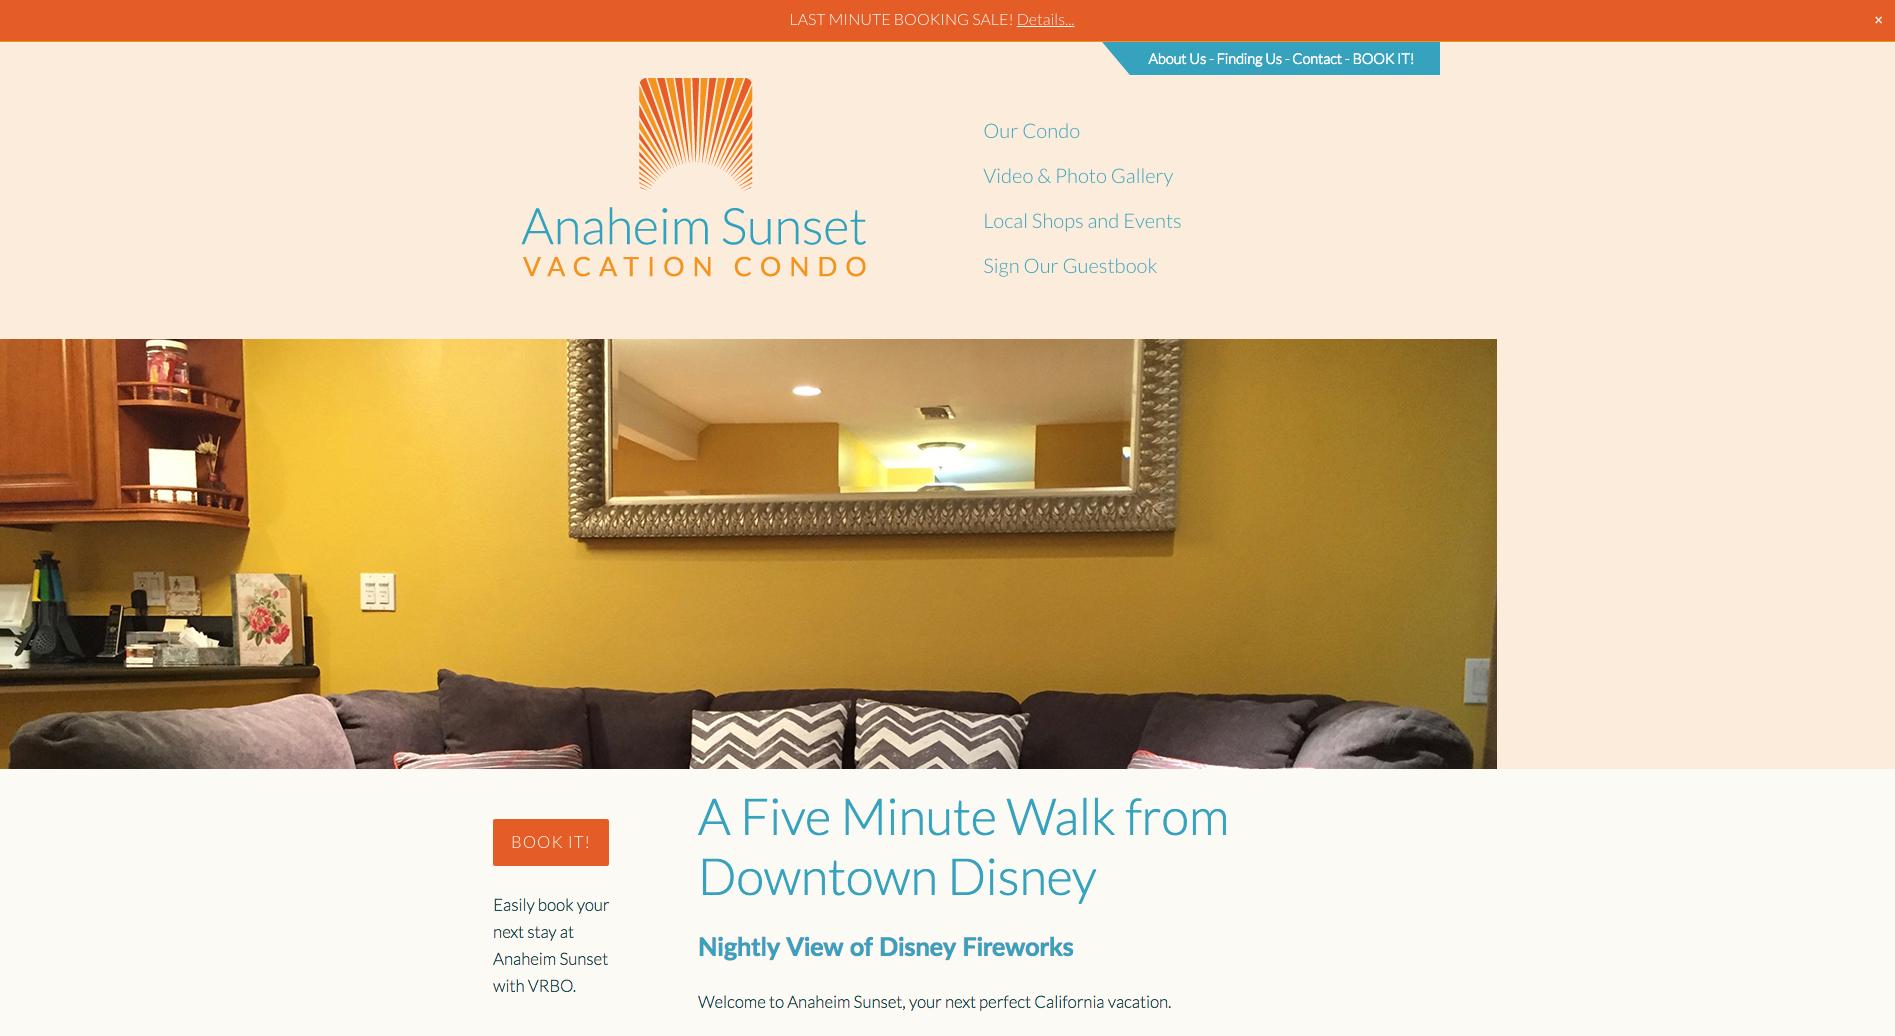 Anaheim Sunset Vacation Condo website, designed by Hoppel Design